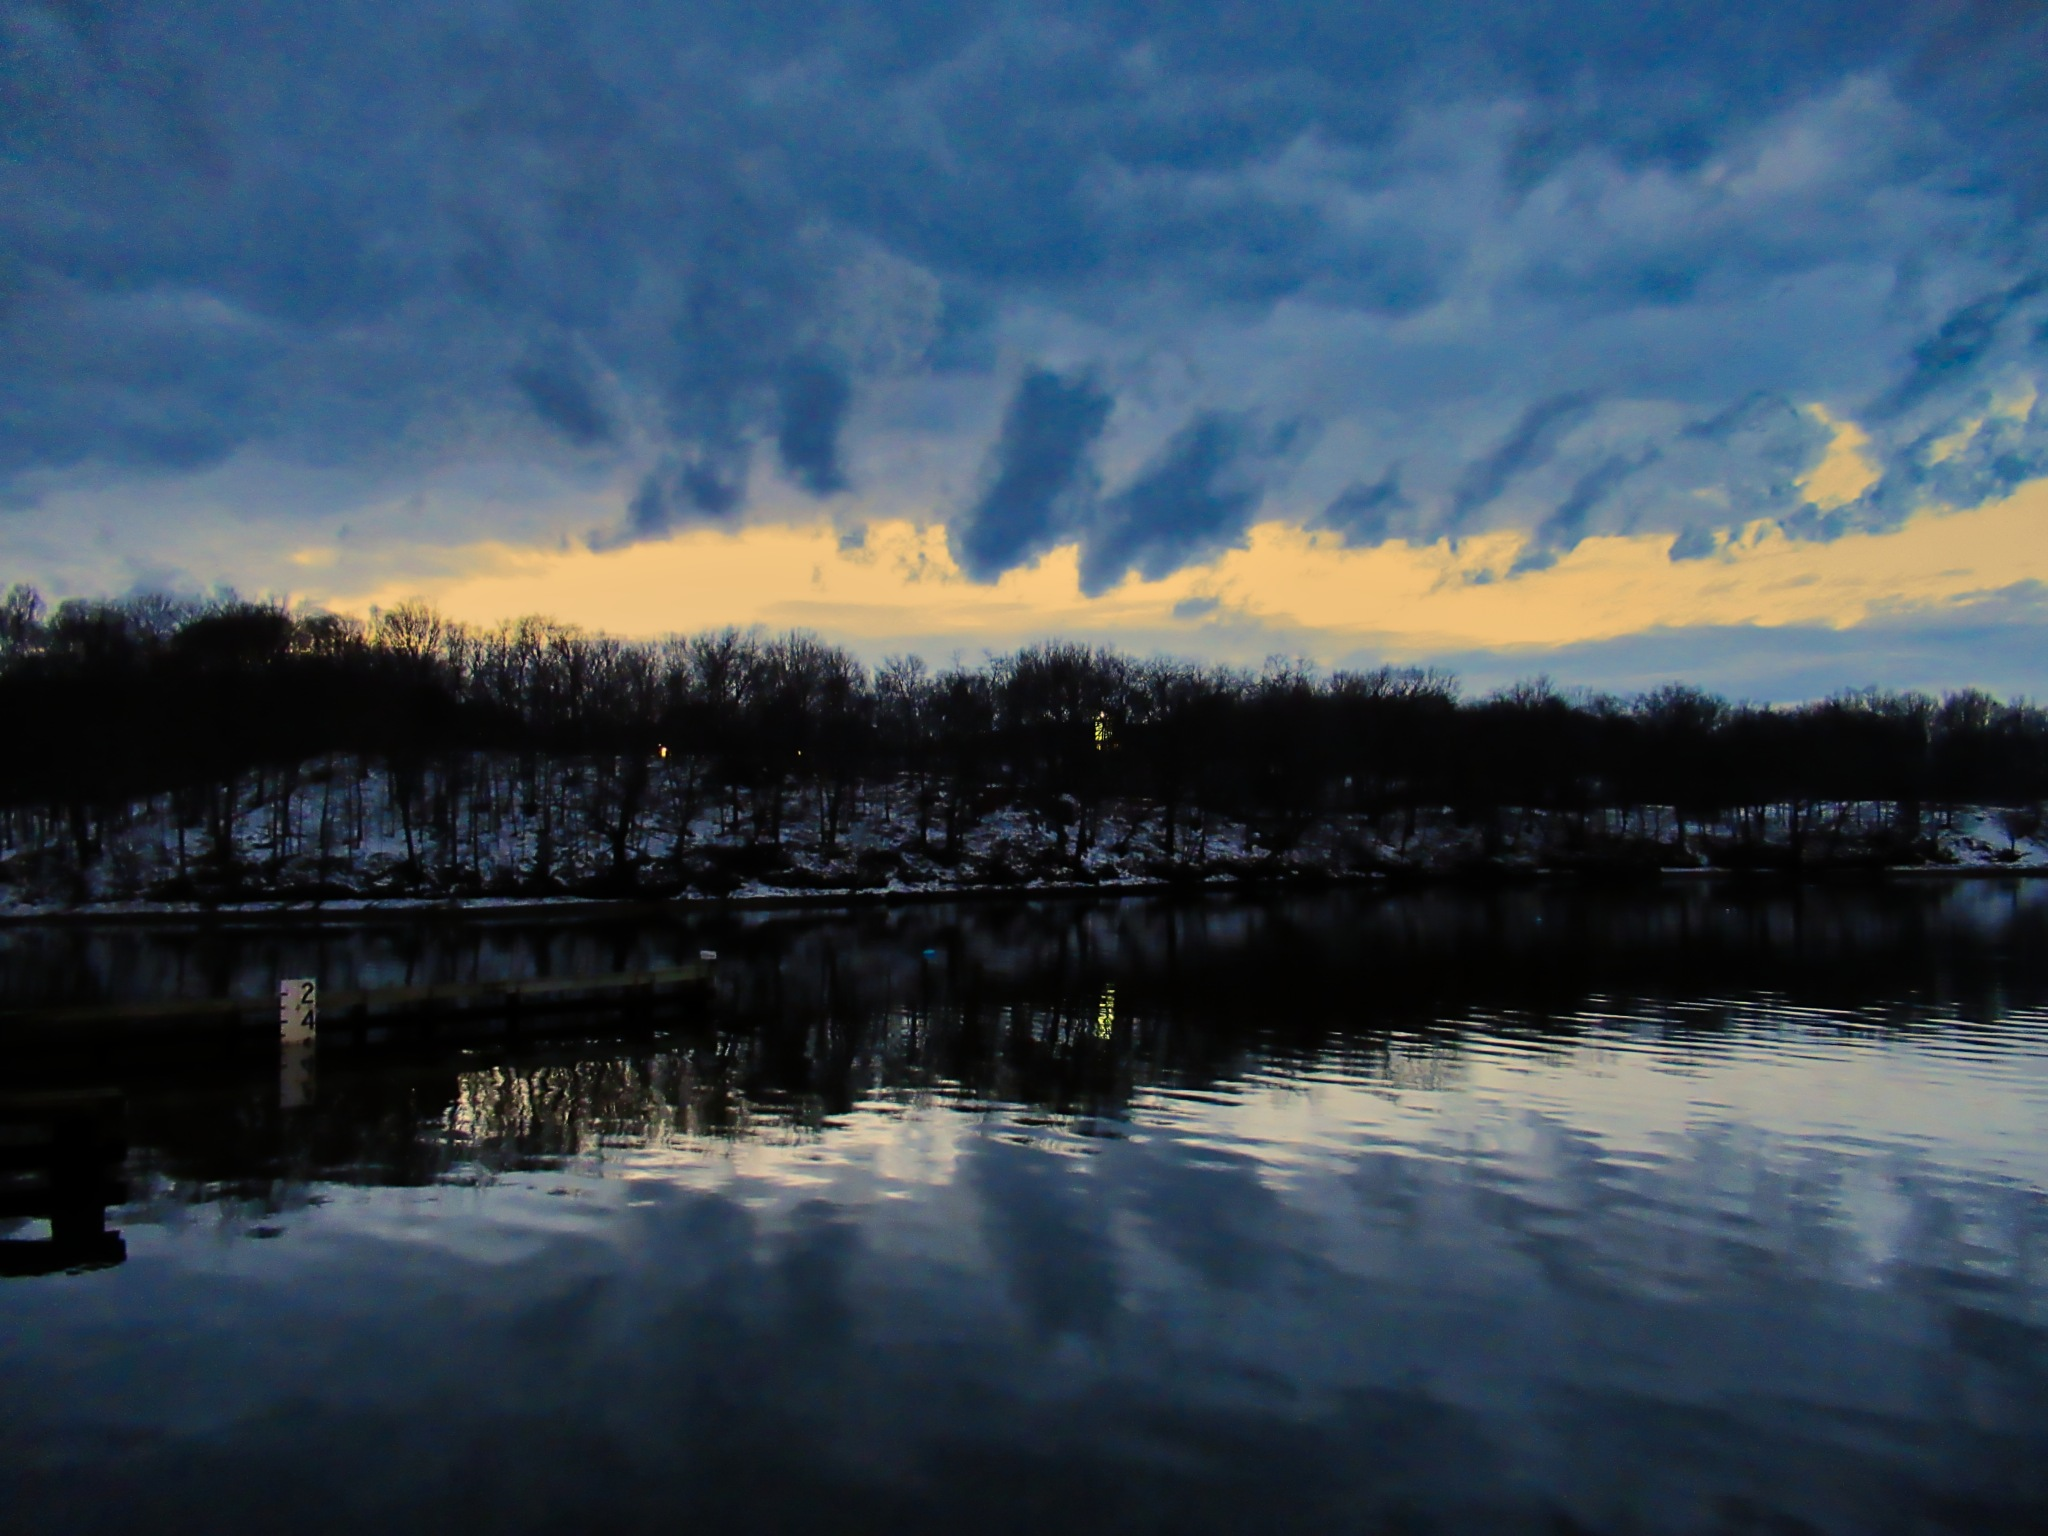 The Bass River after Sunset by D. Scott Hufford